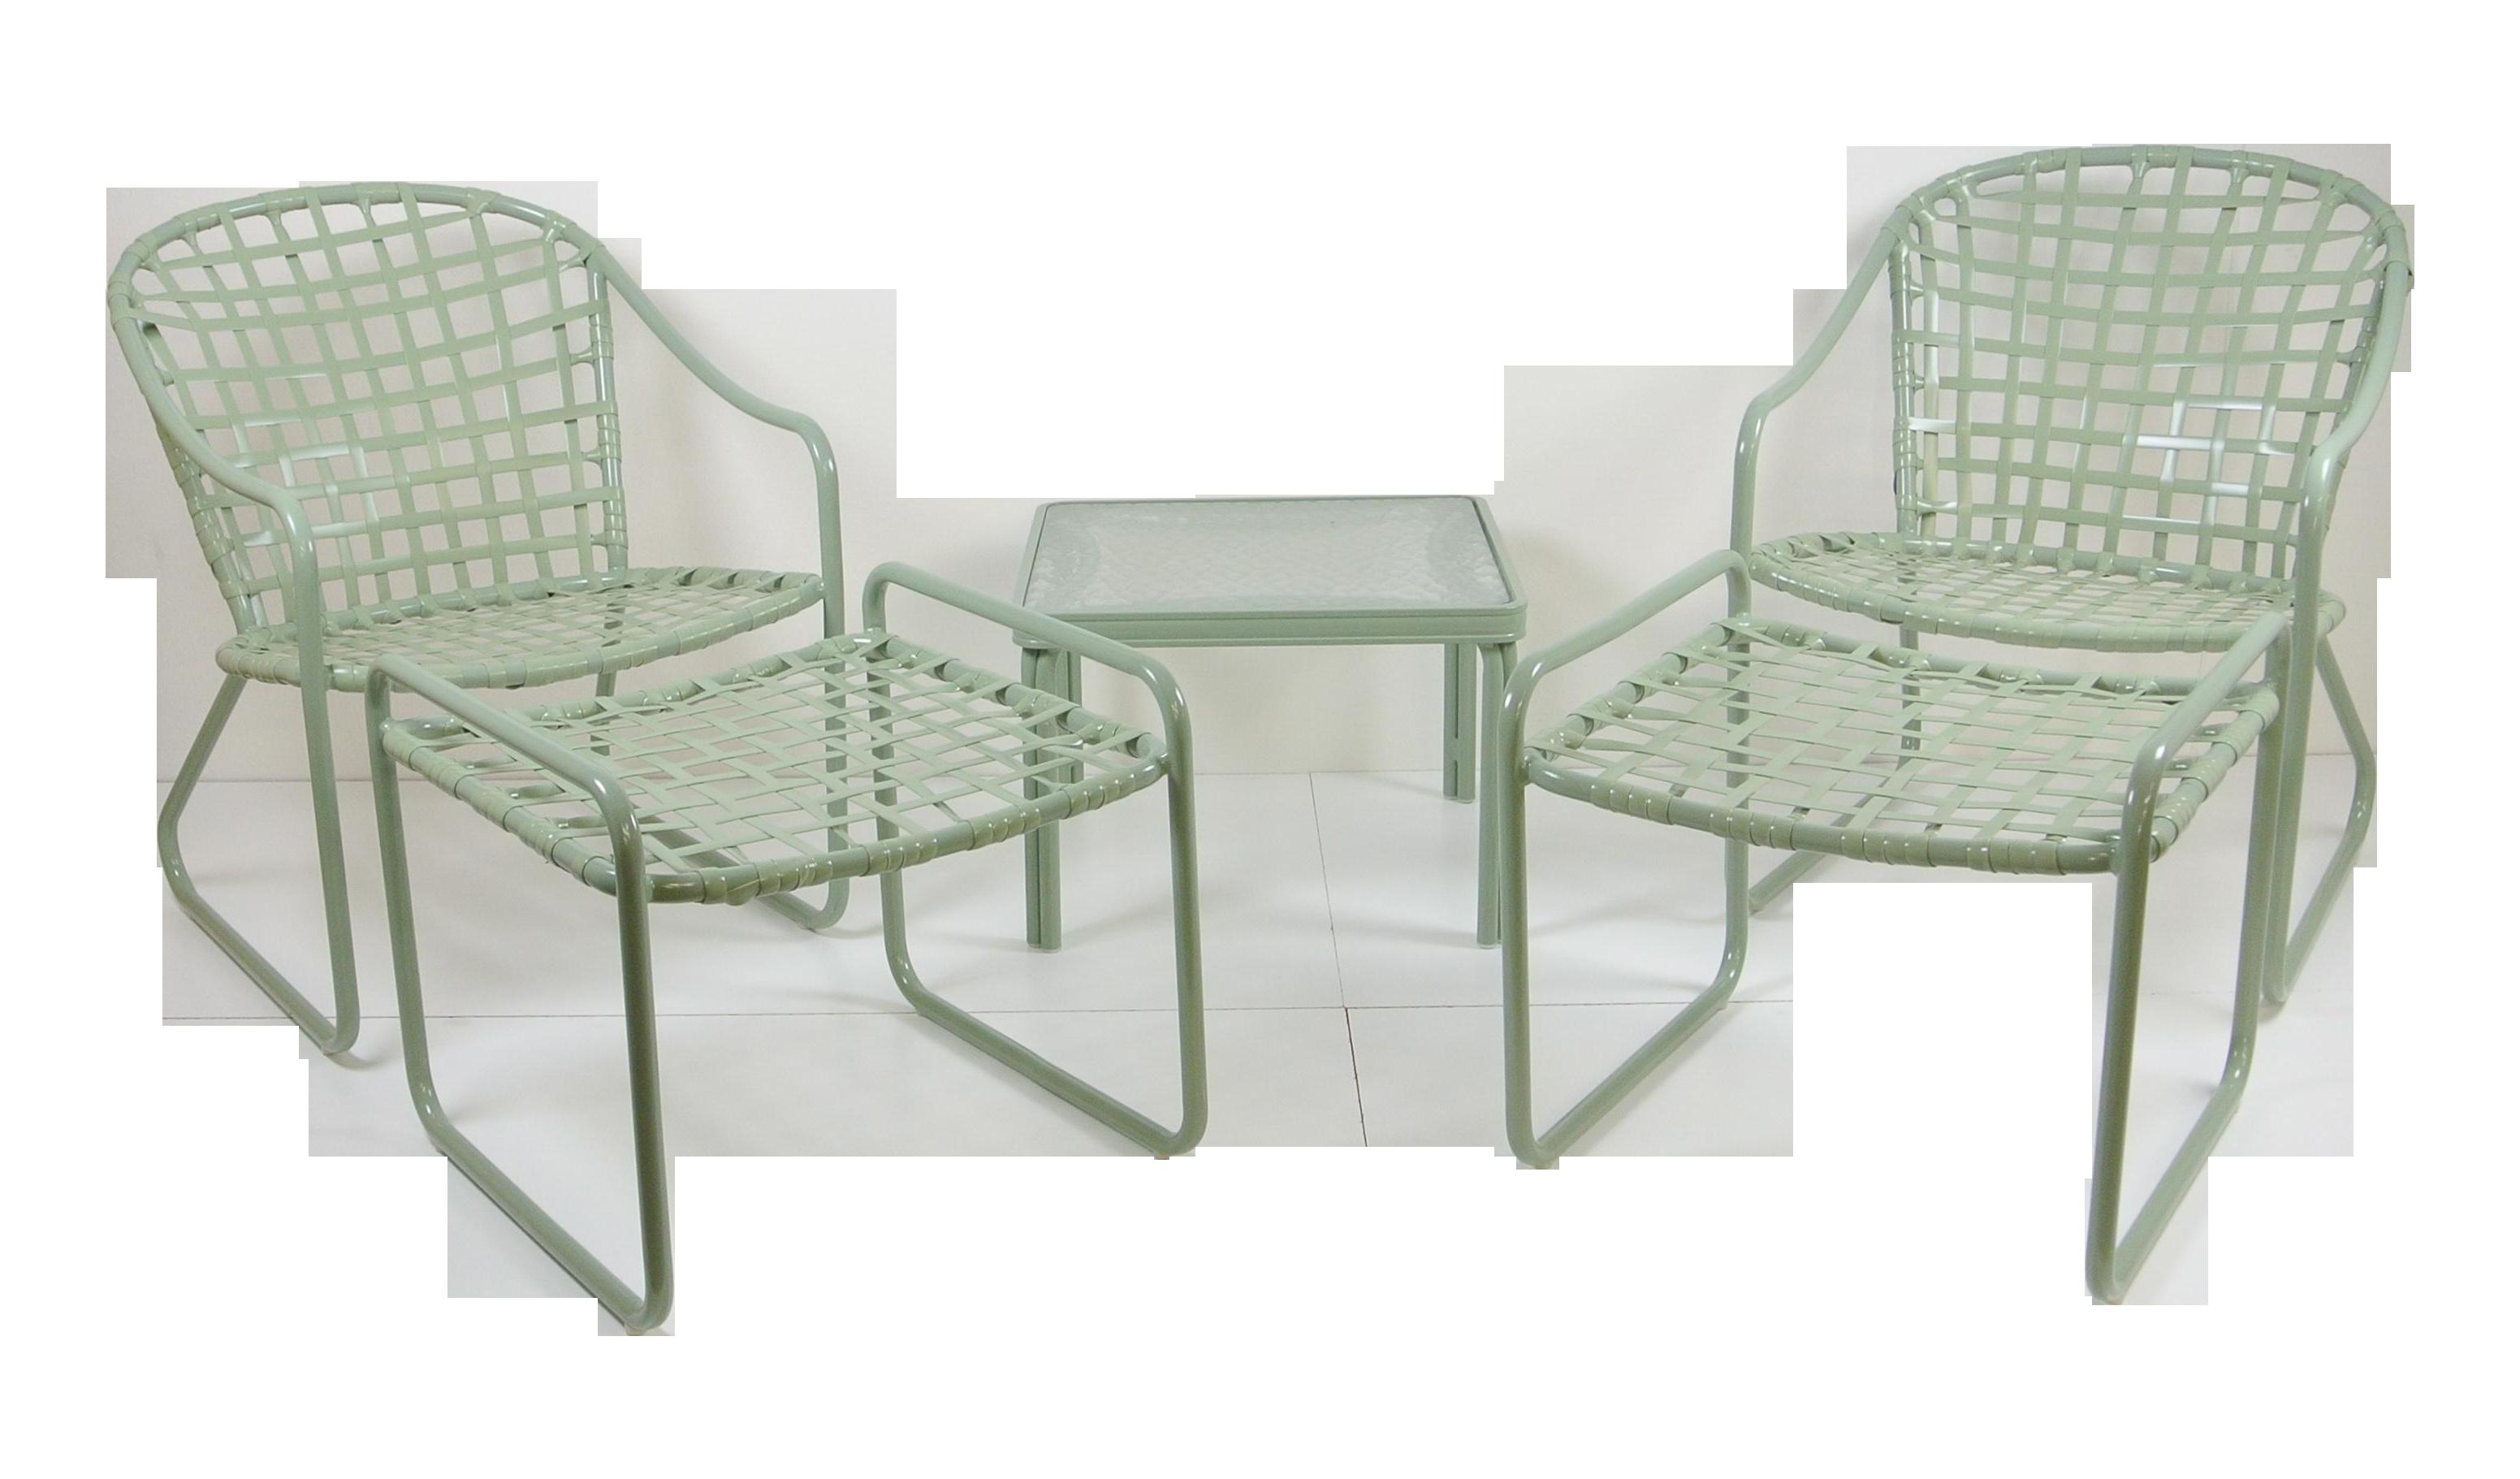 Brown Jordan Vintage Patio Furniture Set Of  Chairish - Jordan outdoor furniture